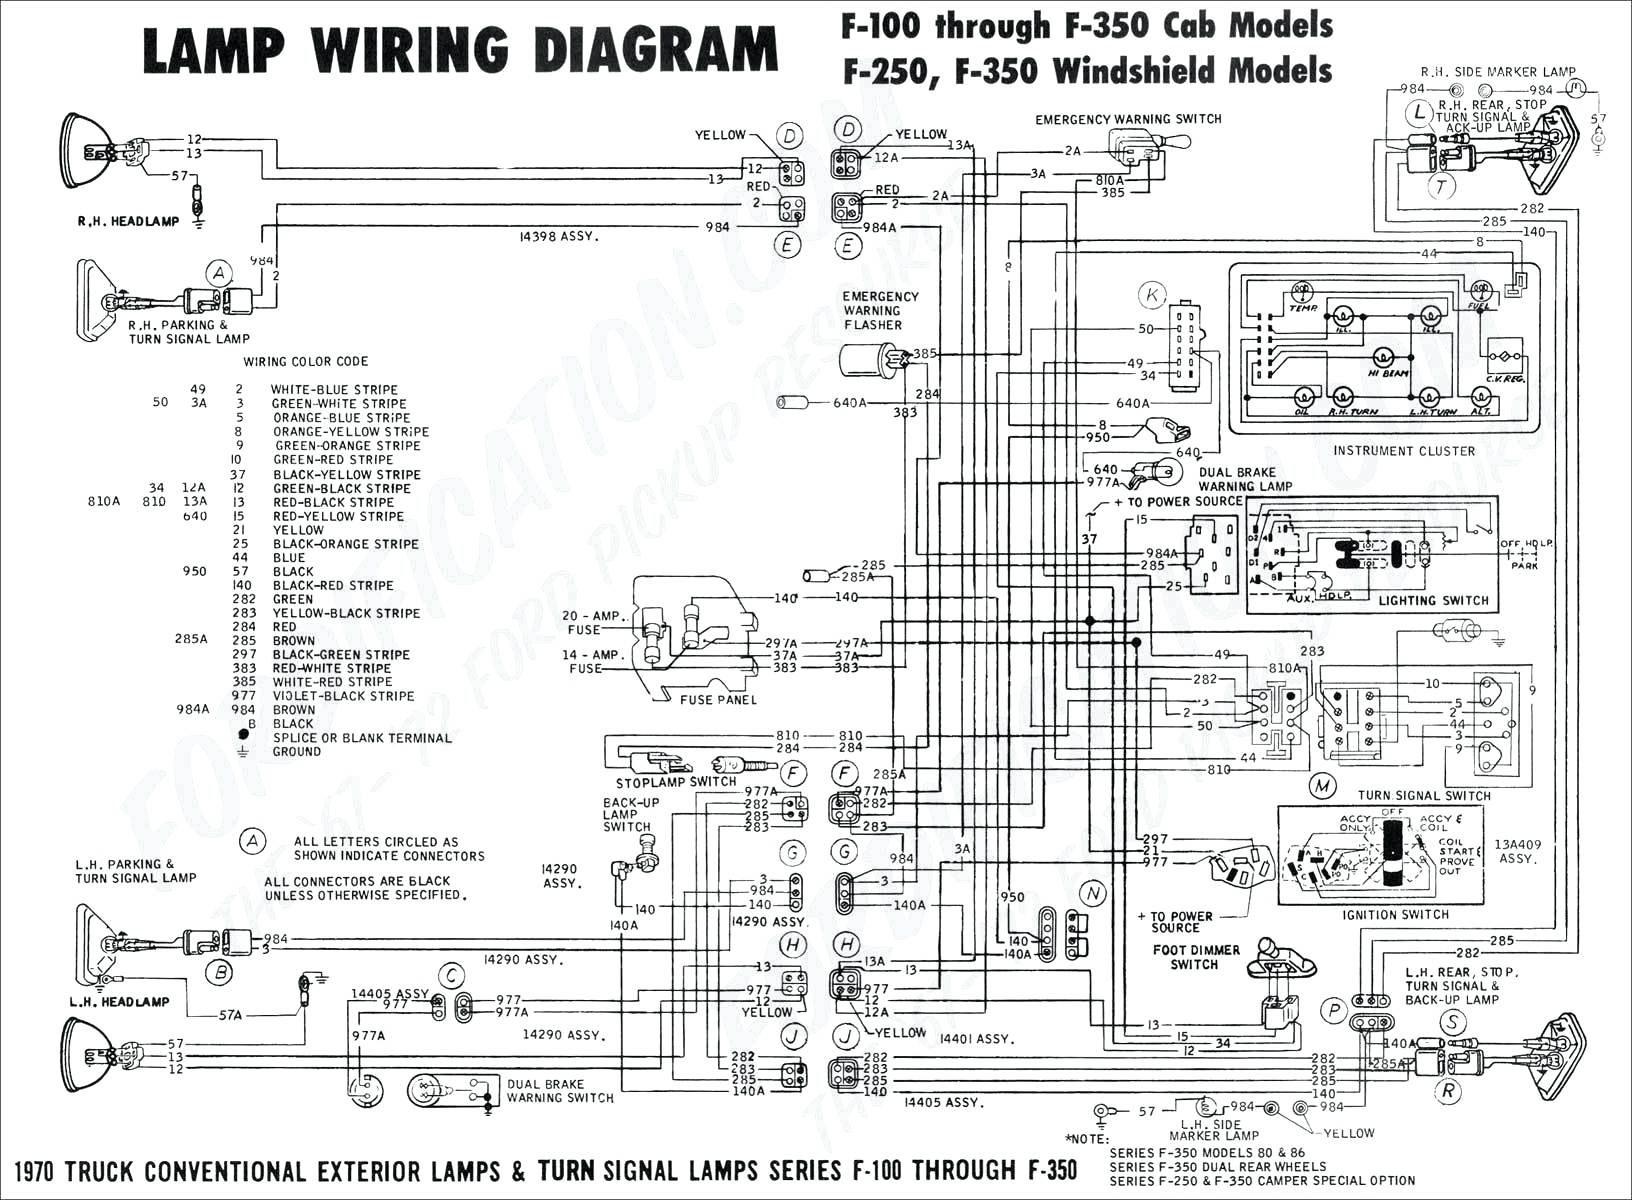 Predator 420cc Engine Wiring Diagram 76dc12c Evo Oem Wiring Harness Diagram Of Predator 420cc Engine Wiring Diagram